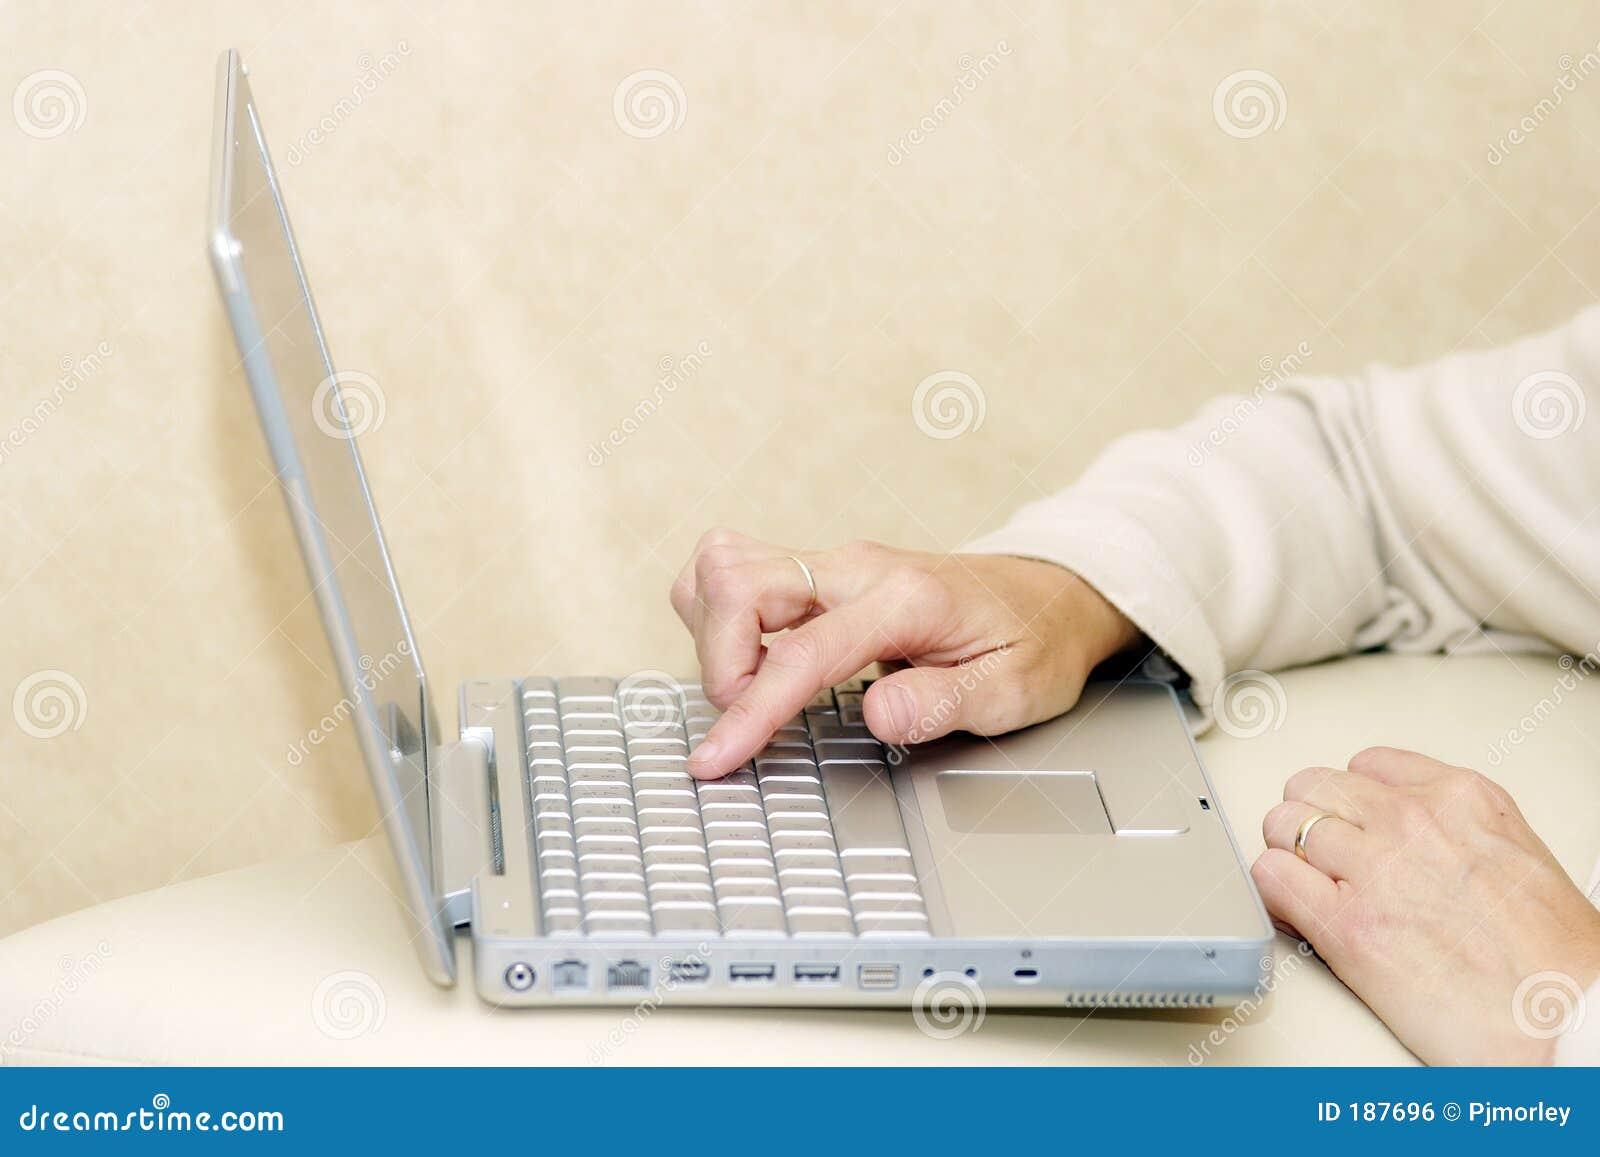 Utilisant un ordinateur portatif